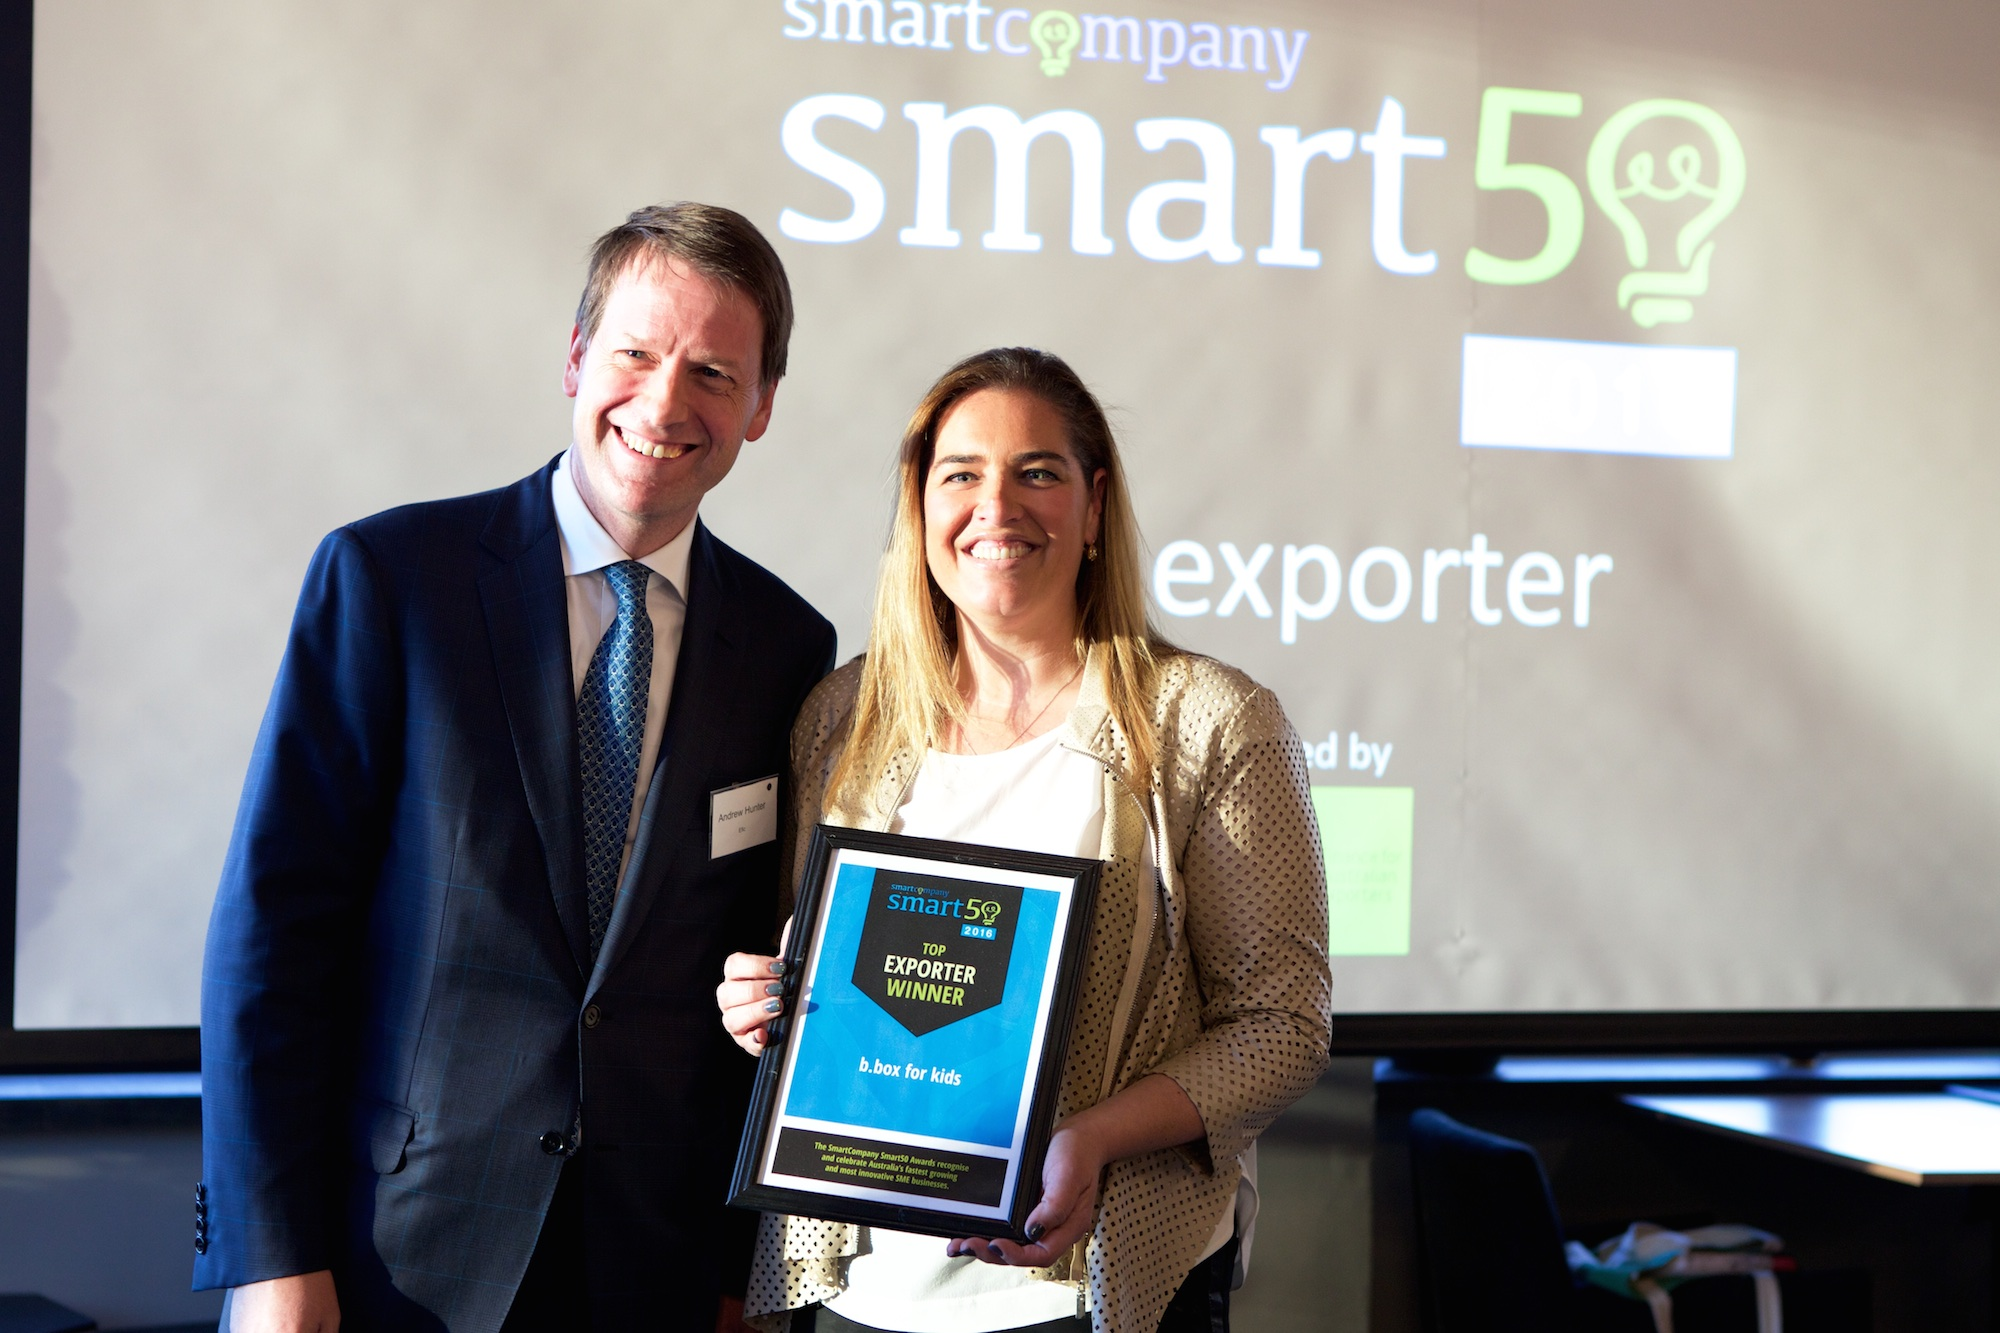 Smart50 b.box for kids